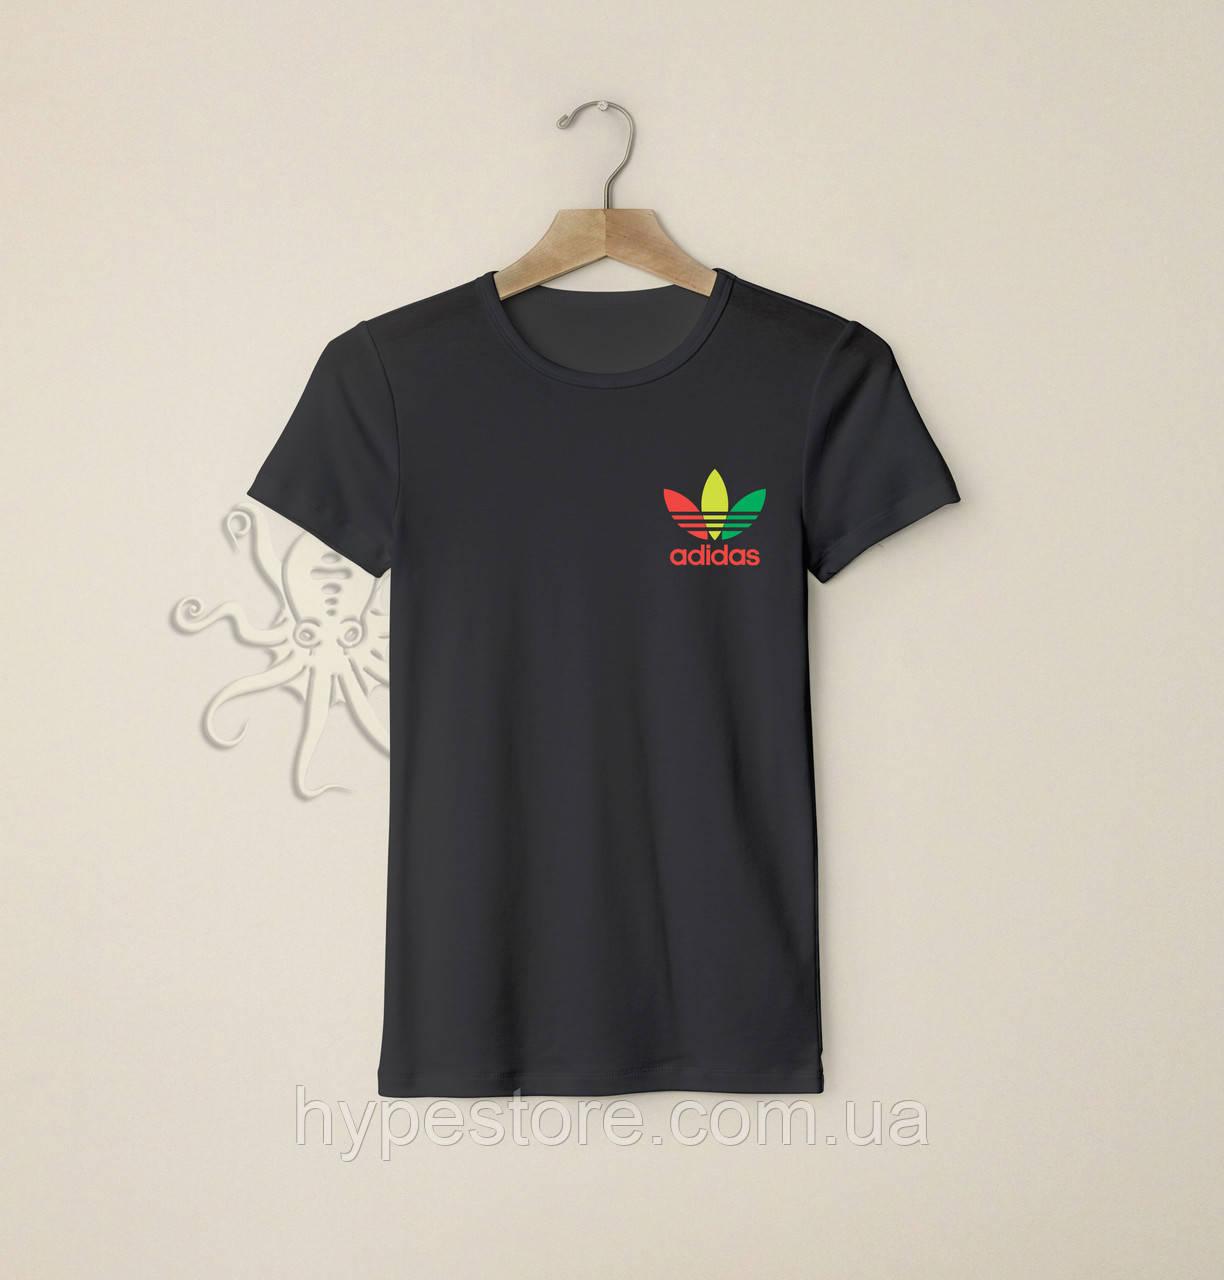 Мужская черная футболка, чоловіча футболка Adidas, Реплика